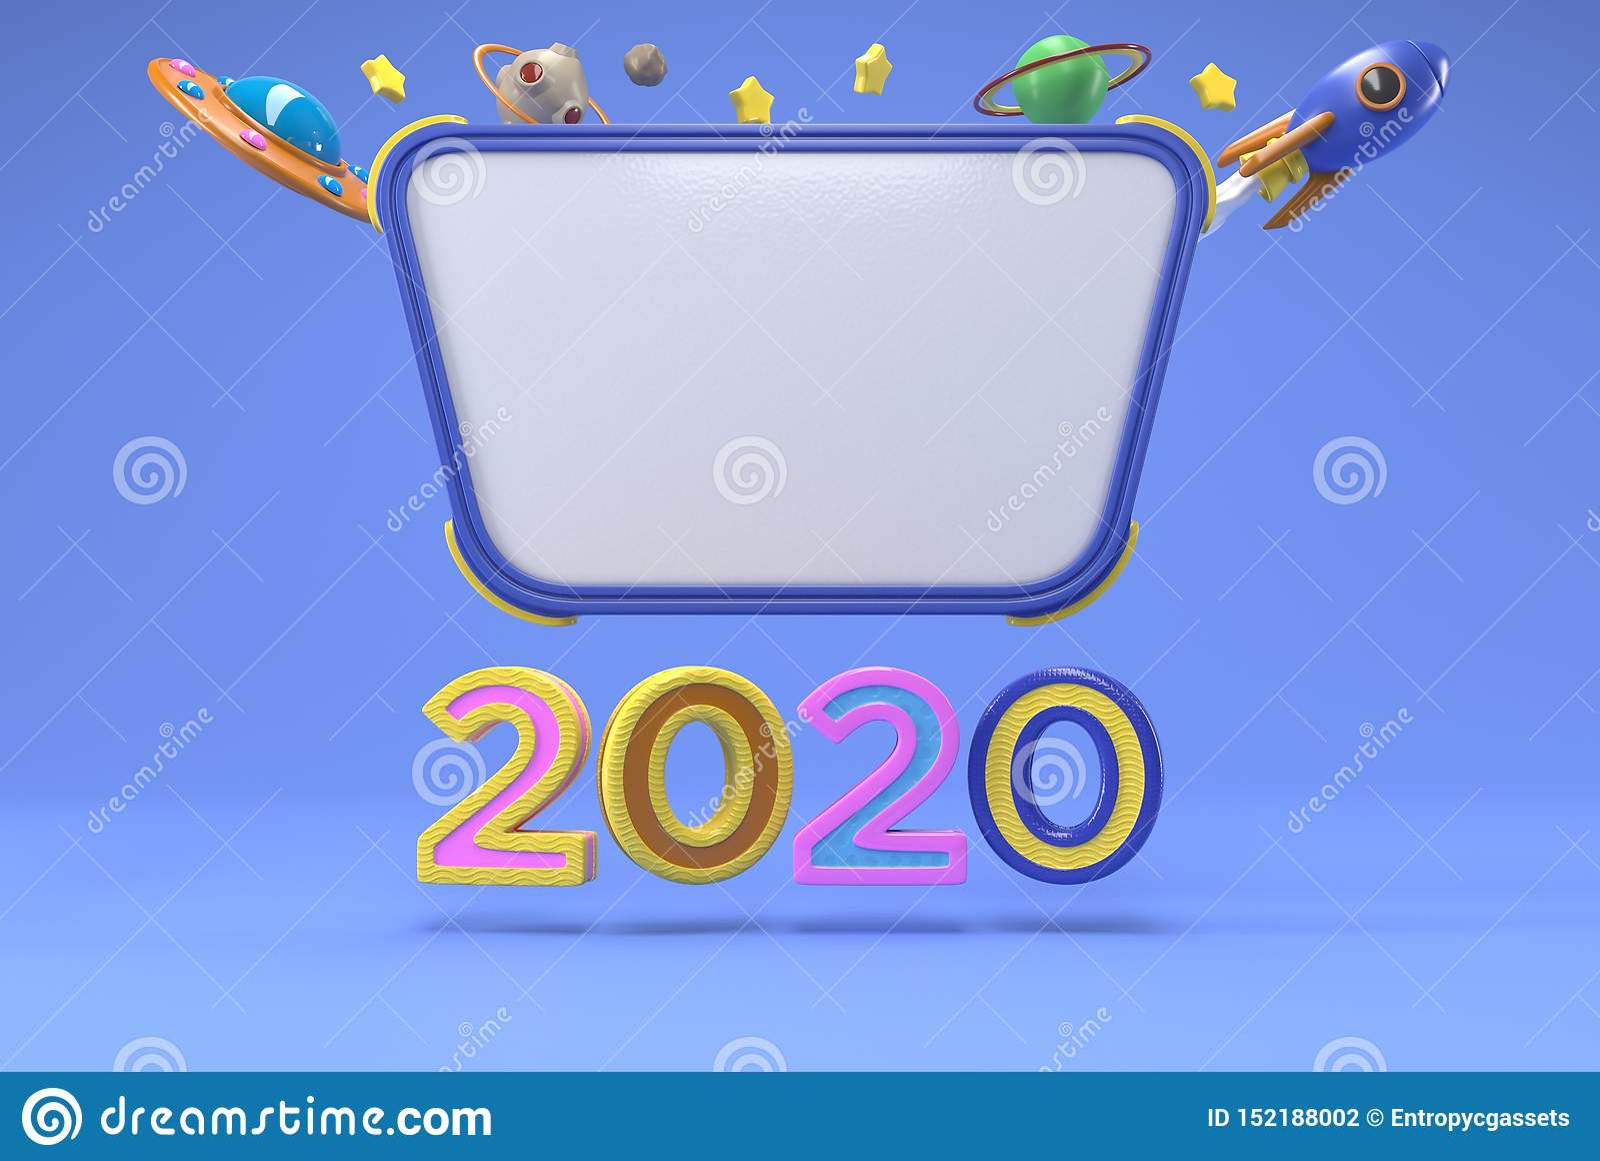 Cartoon Message Board